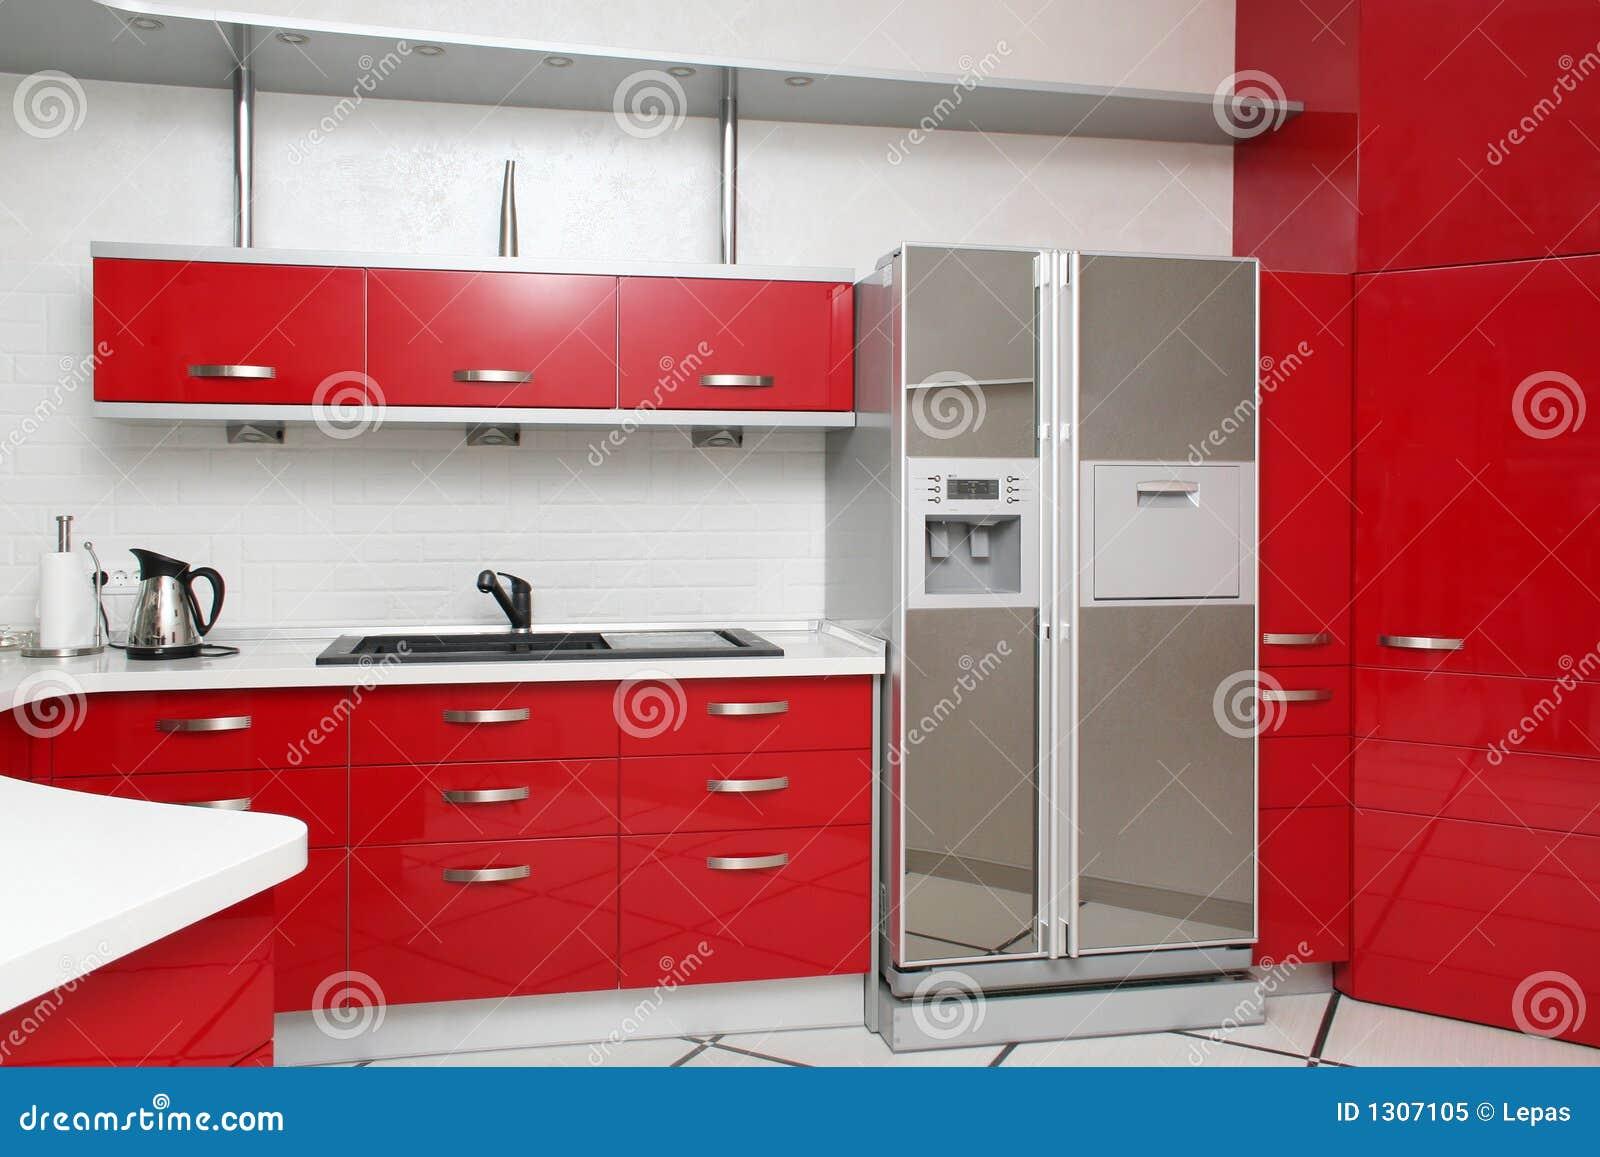 Cucina rossa fotografia stock libera da diritti immagine - Cucina laccata rossa ...